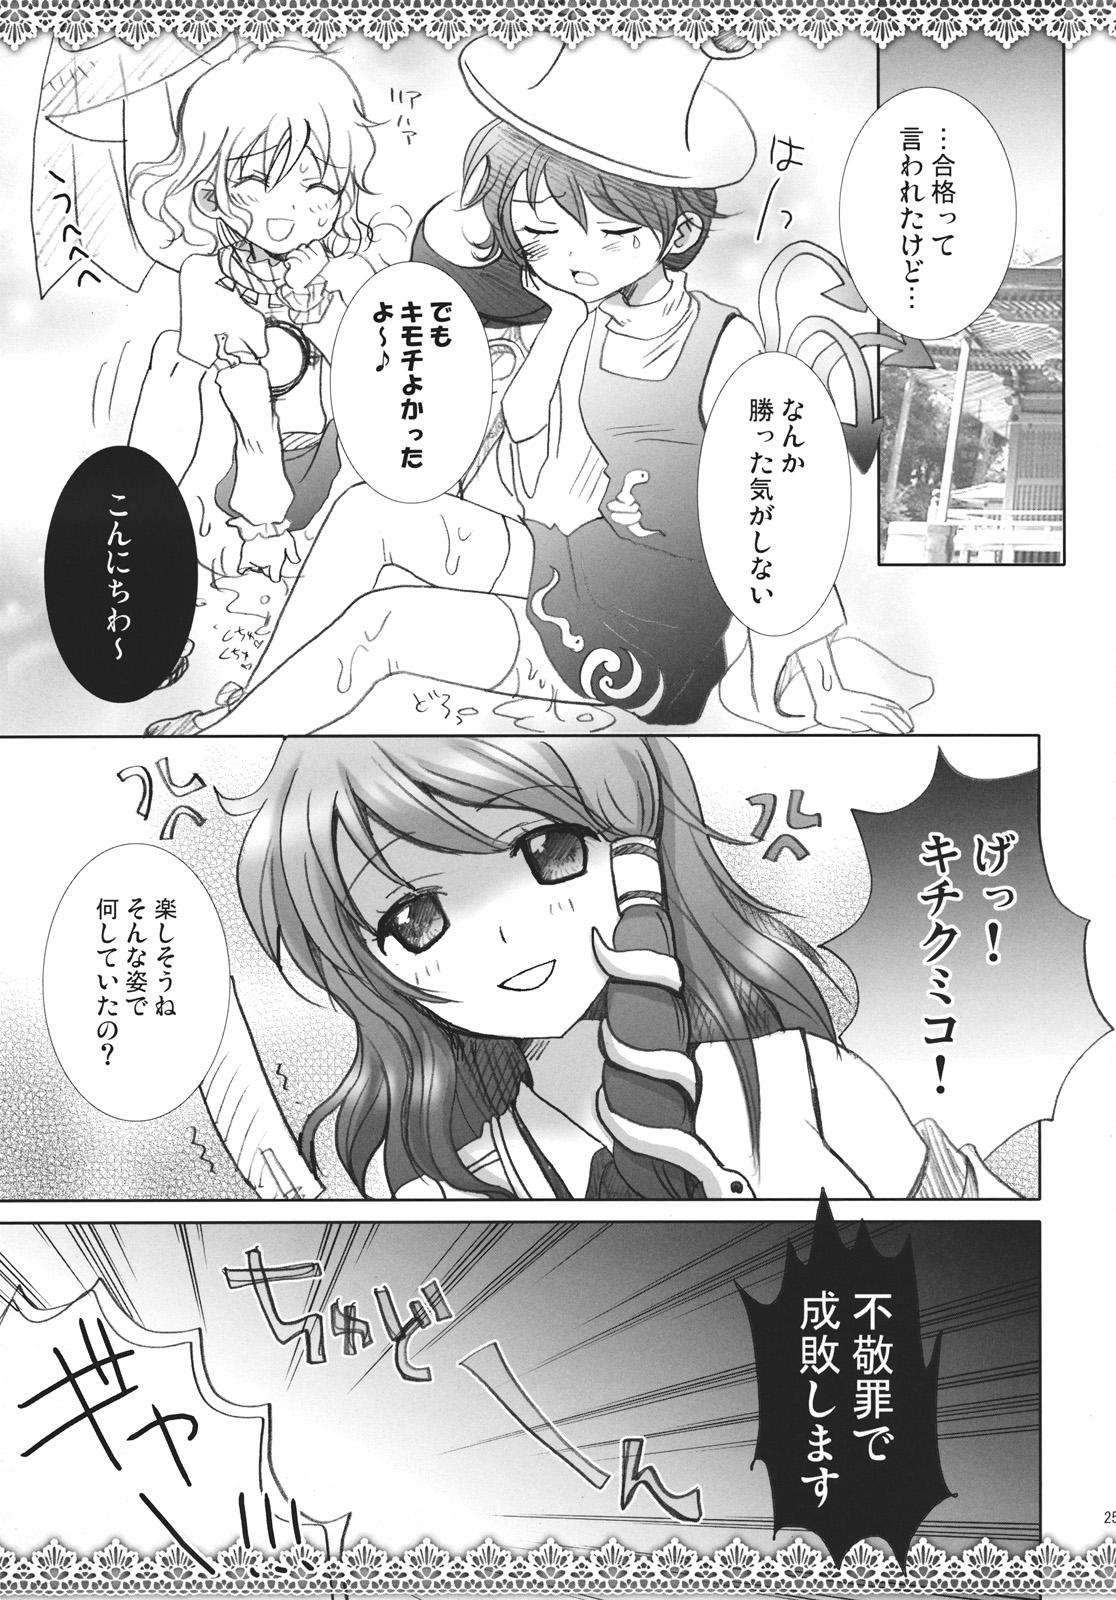 Sanae-san funtouzhu! 24